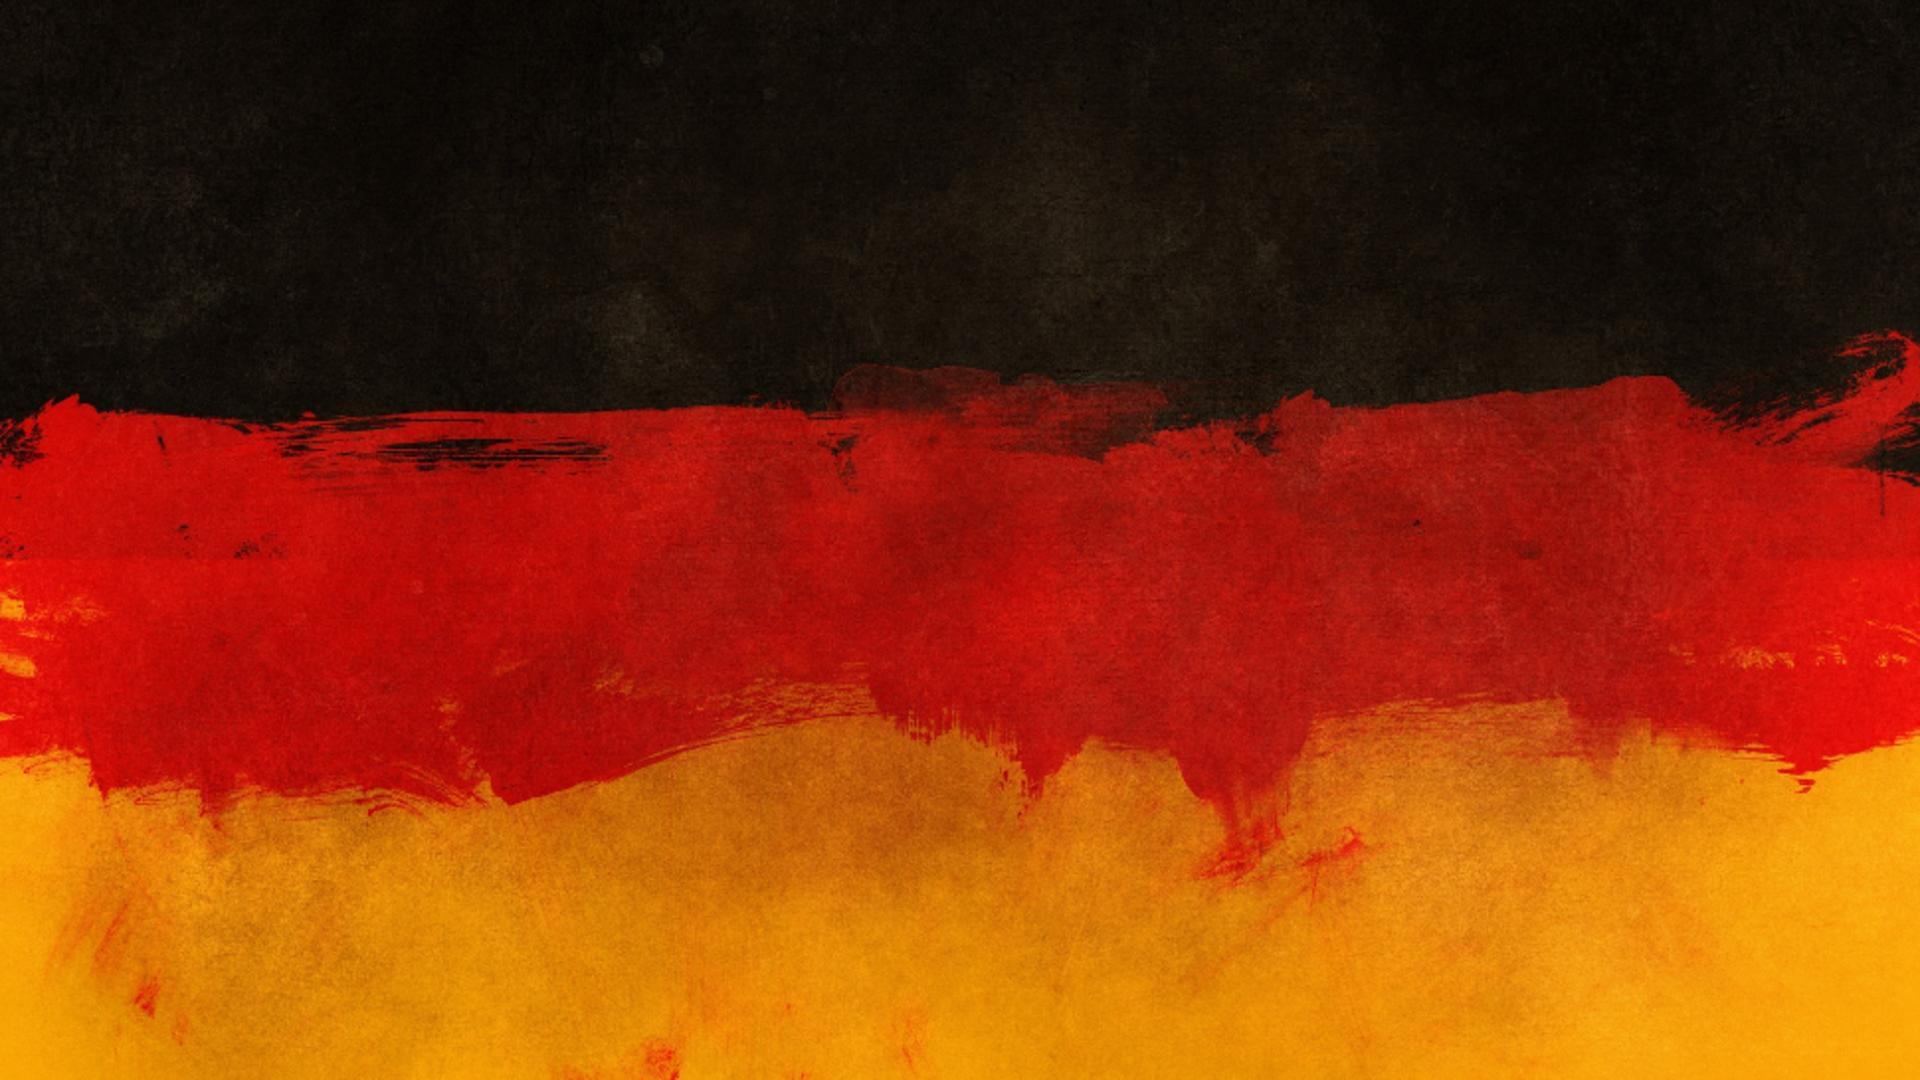 Teste anti-Covid, obligatorii pe aeroporturile germane/sursa foto: Pixabay